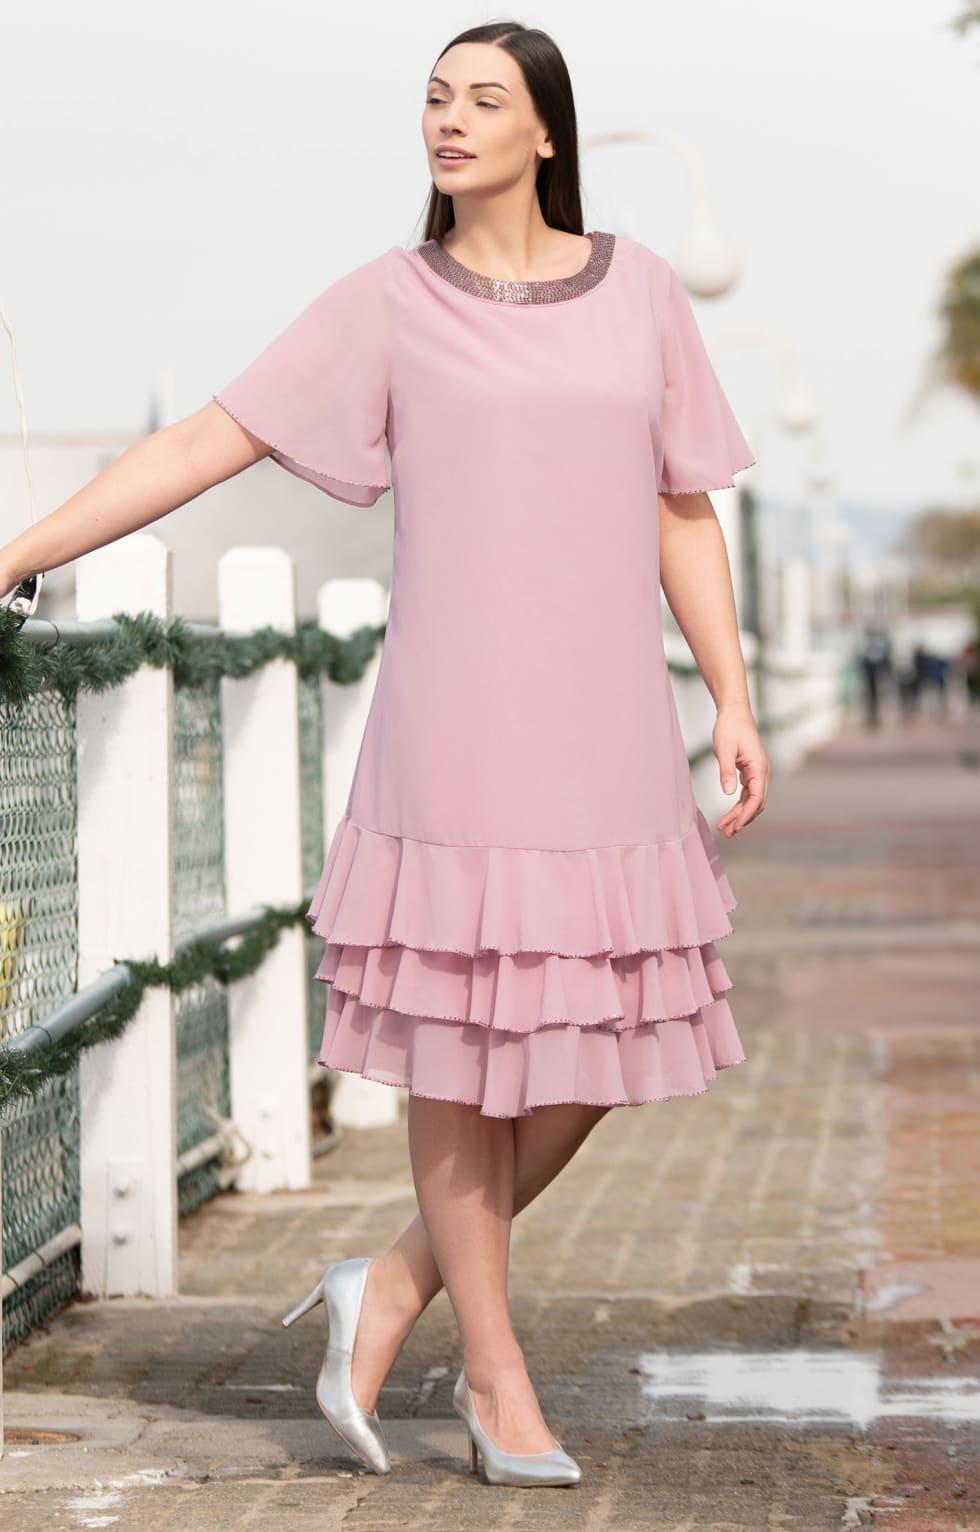 MIAMODA Große Größen Mode Bloggerin Silvana Denker in Los Angeles